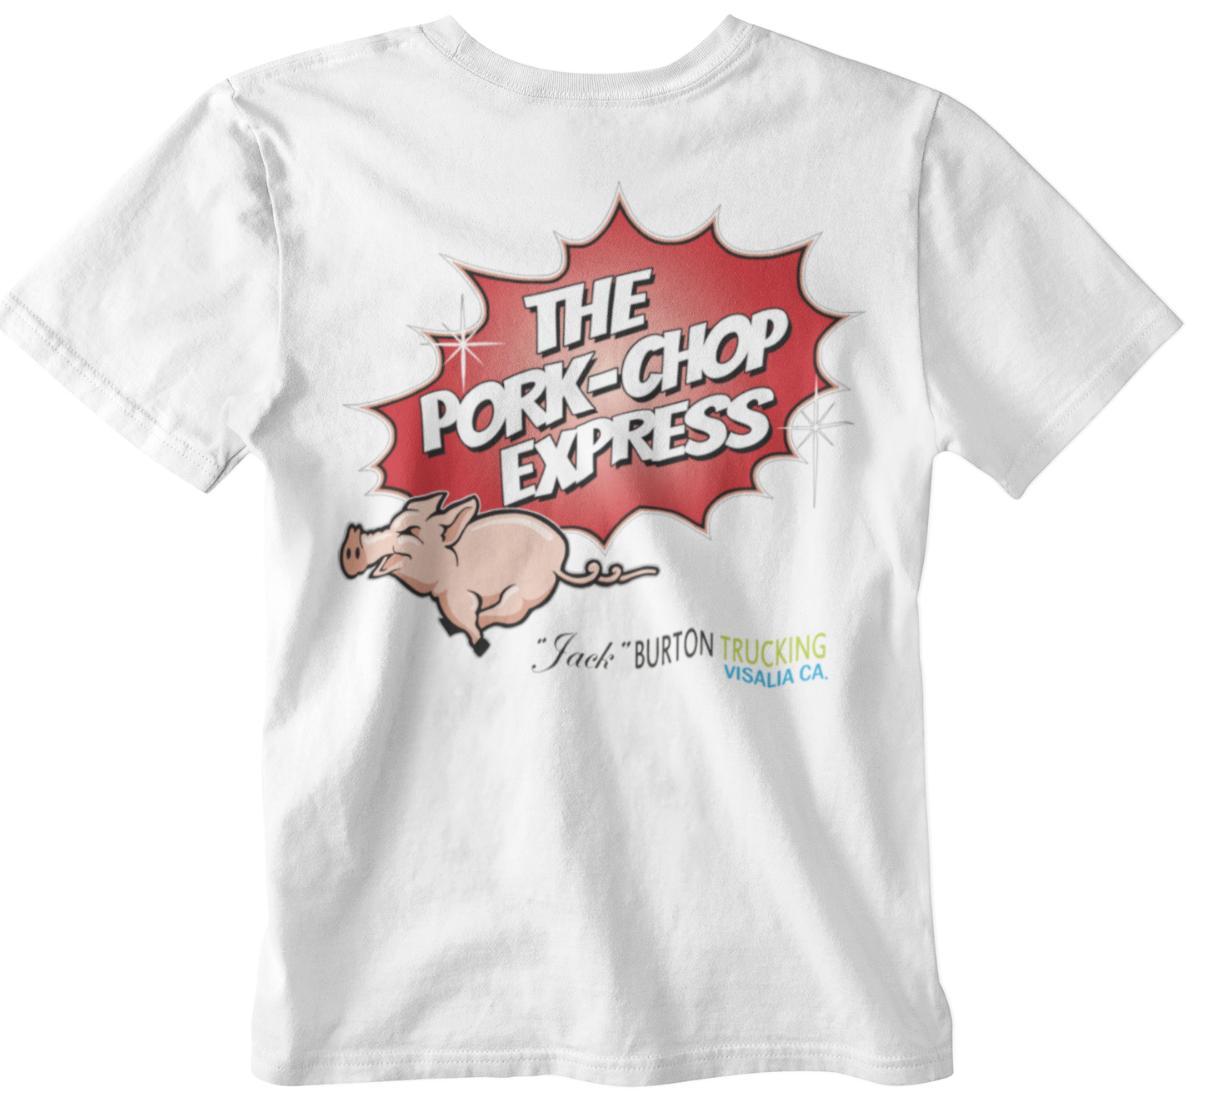 Big Trouble T Shirt Pork Chop Express Little China Movie 80s Classic